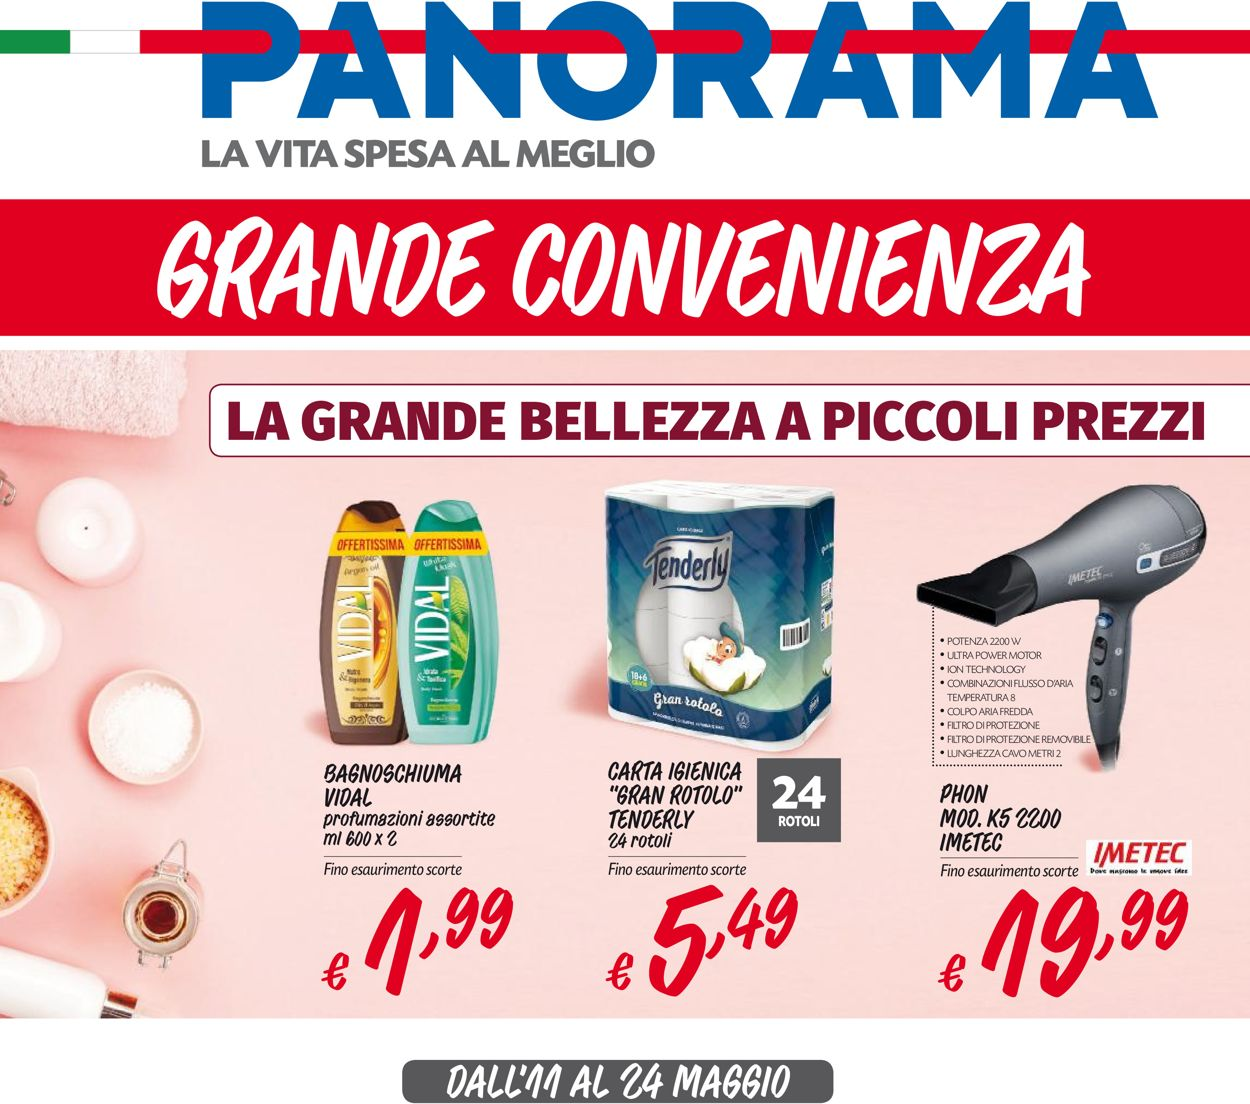 Volantino Pam Panorama - Offerte 11/05-24/05/2020